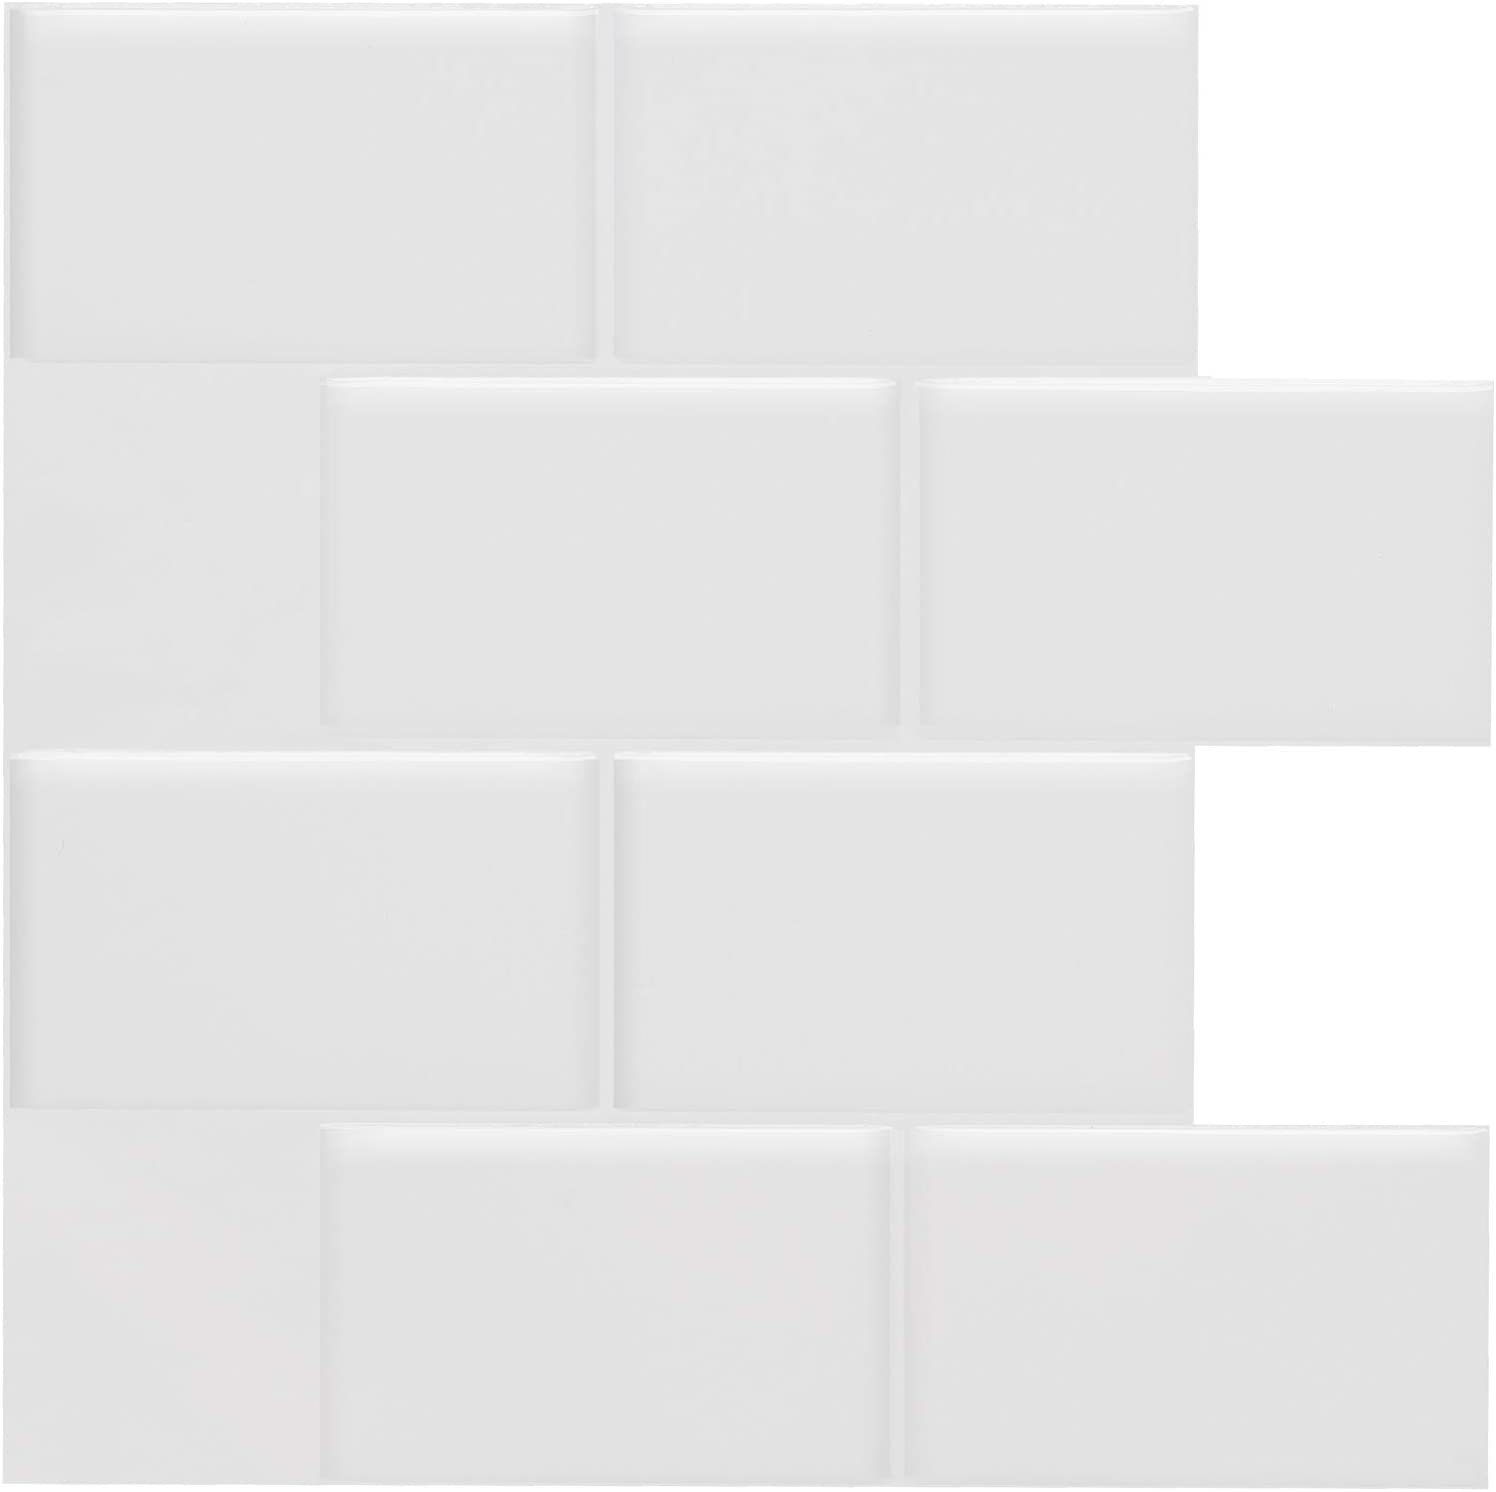 10 x 10 inch Subway White Deco i Amour Peel and Stick Tile Backsplash for Kitchen Bathroom Self Adhesive Stick On Tile 5 Sheets